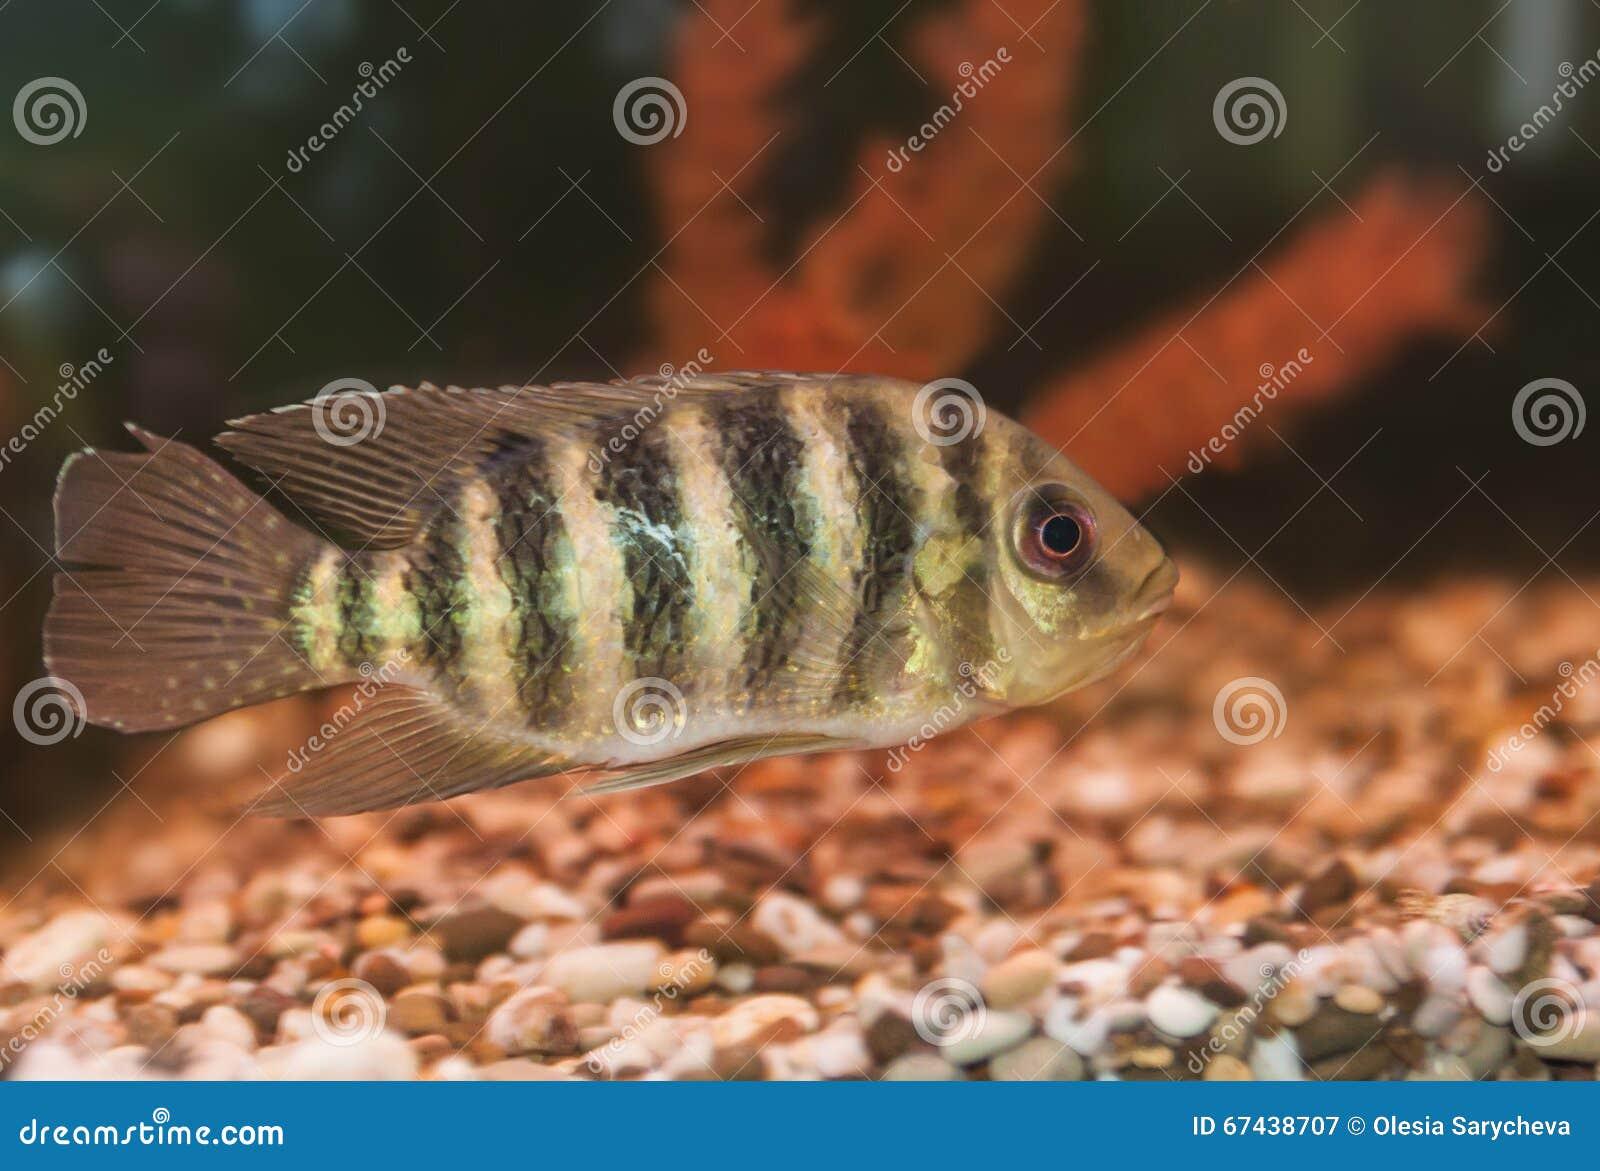 Striped Aquarium Fish Cichlid Group Stock Image Image Of Nature